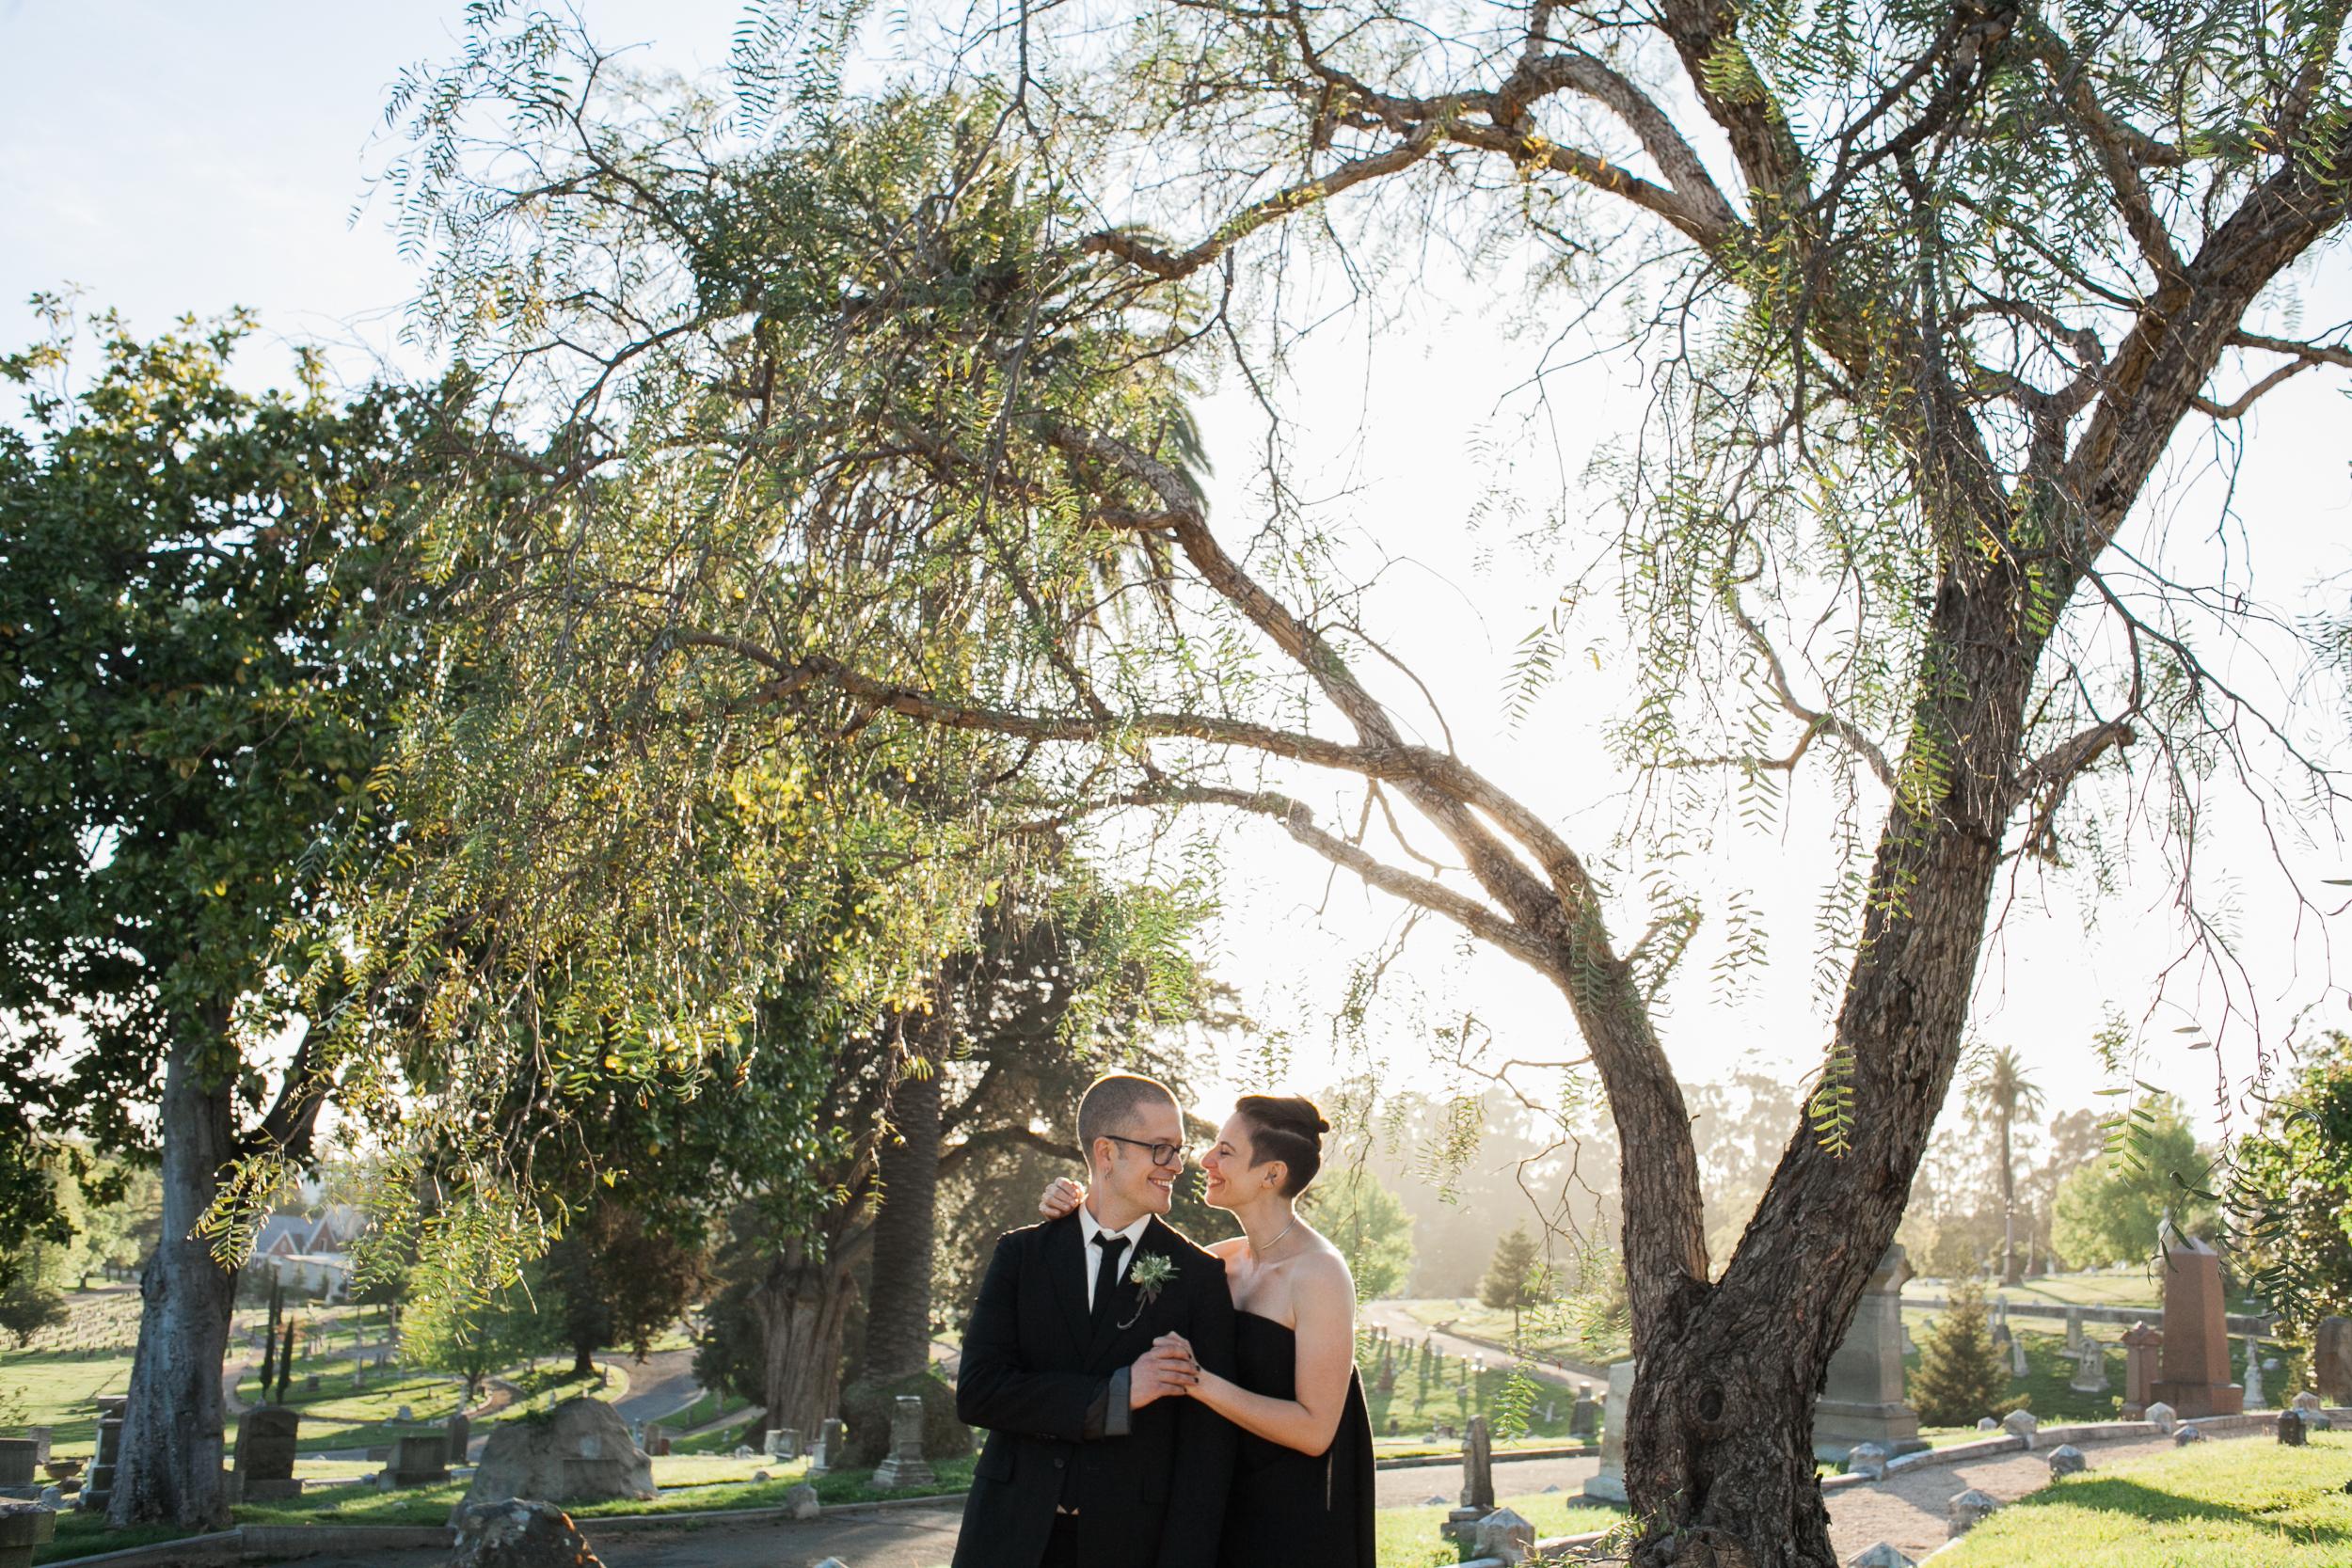 042717_A+Y_Oakland Wedding_Buena Lane Photography_1956-Edit.jpg